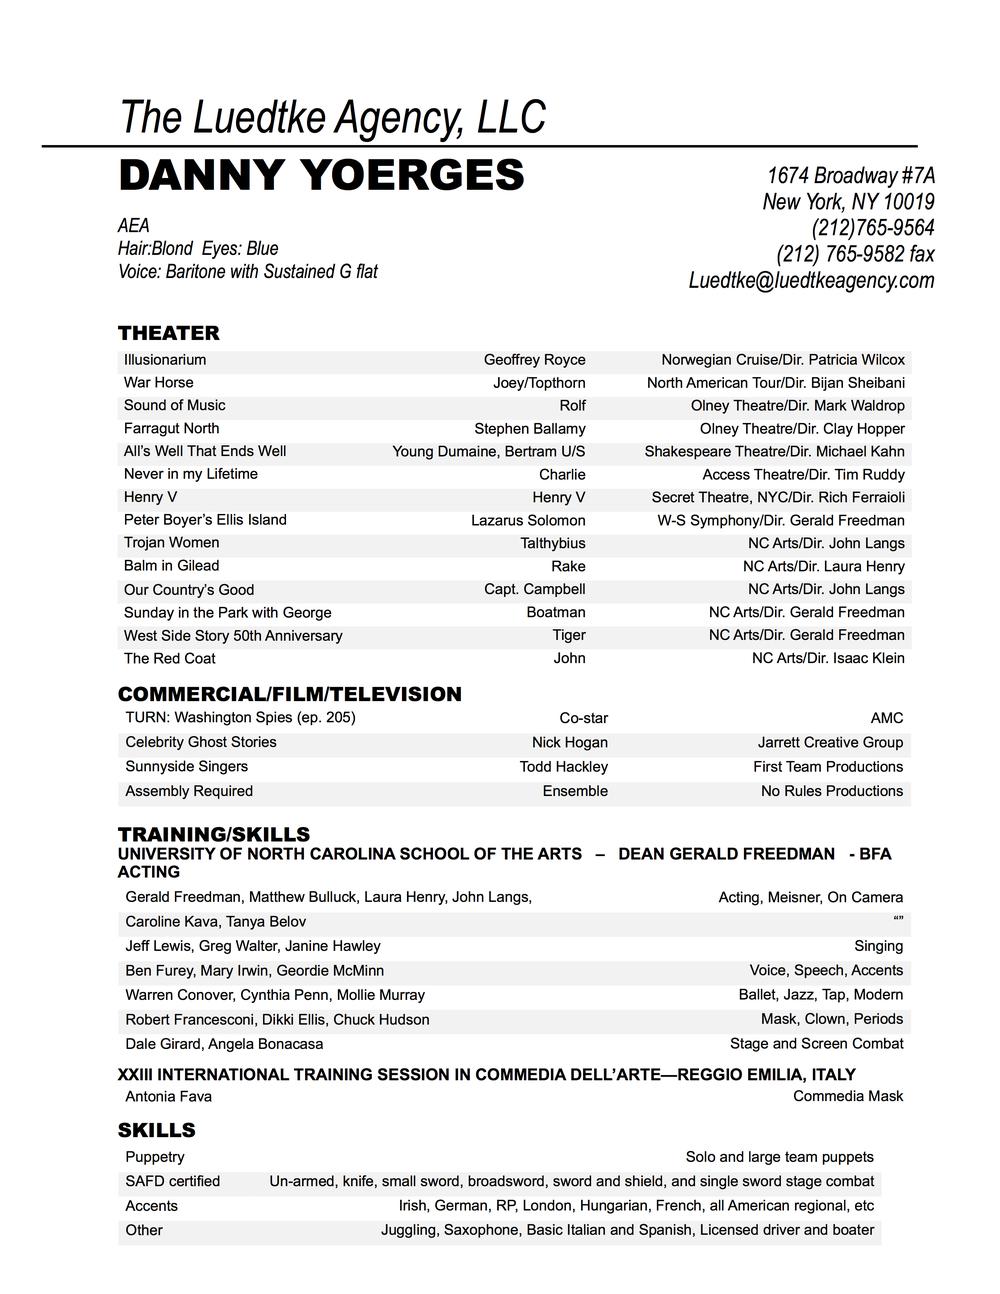 DANNY YOERGES RESUME Luedtke.jpg